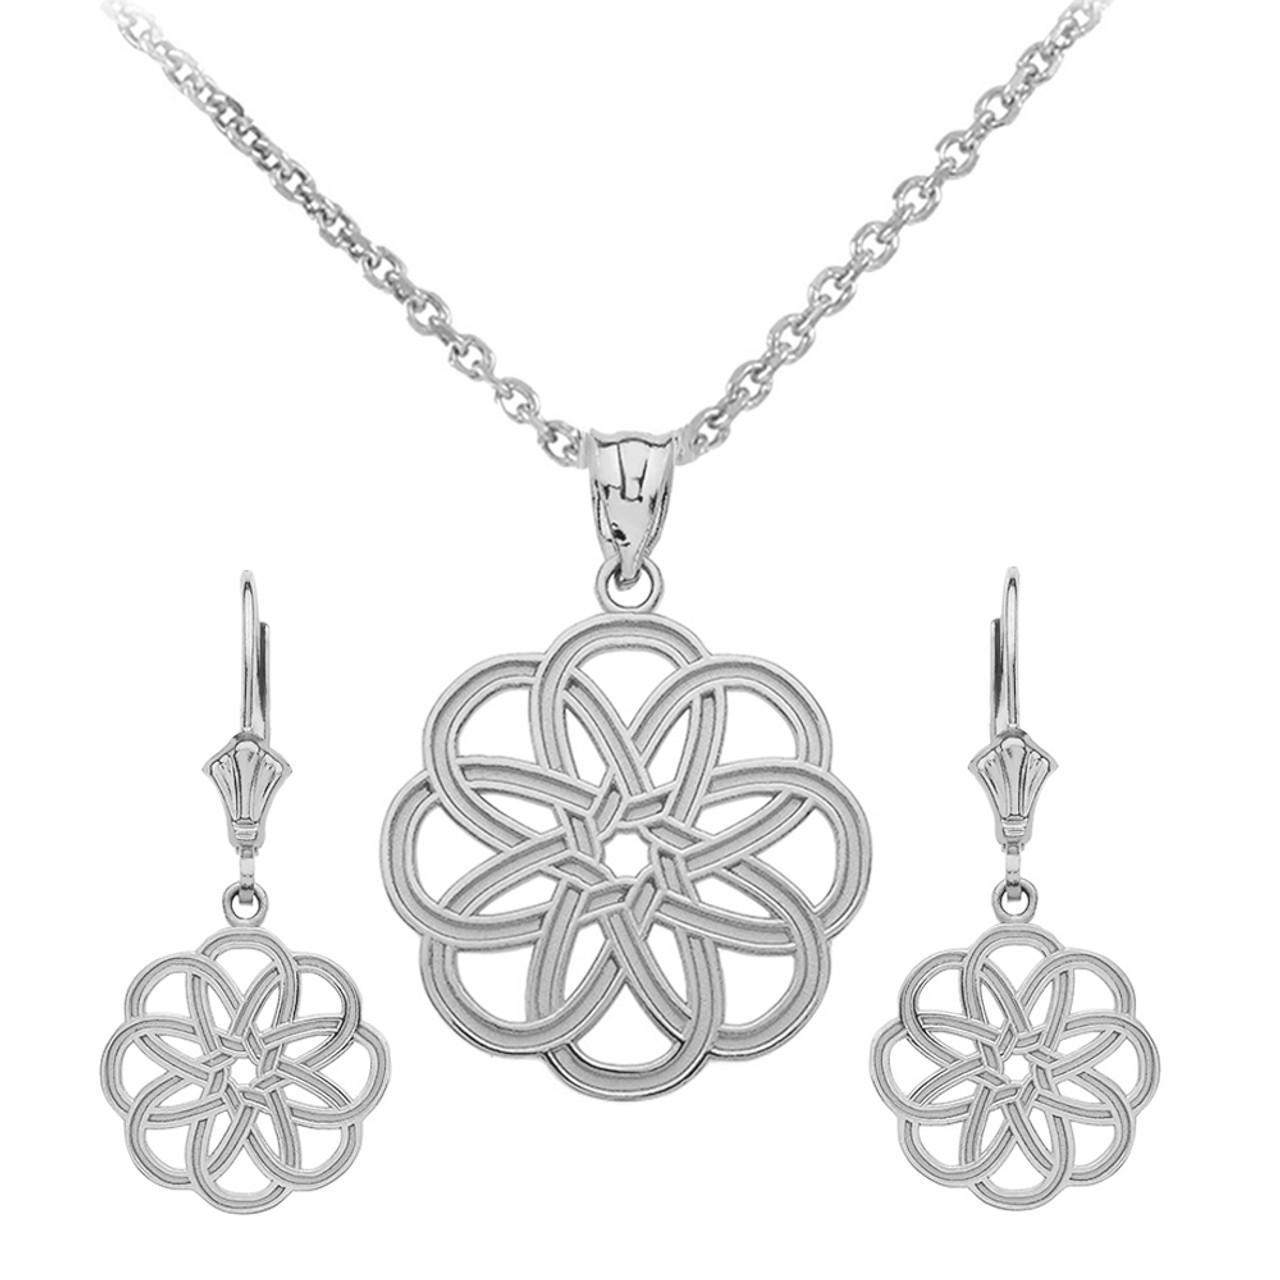 e4da11c4b Sterling Silver Celtic Knot Round Flower Necklace Earring Set